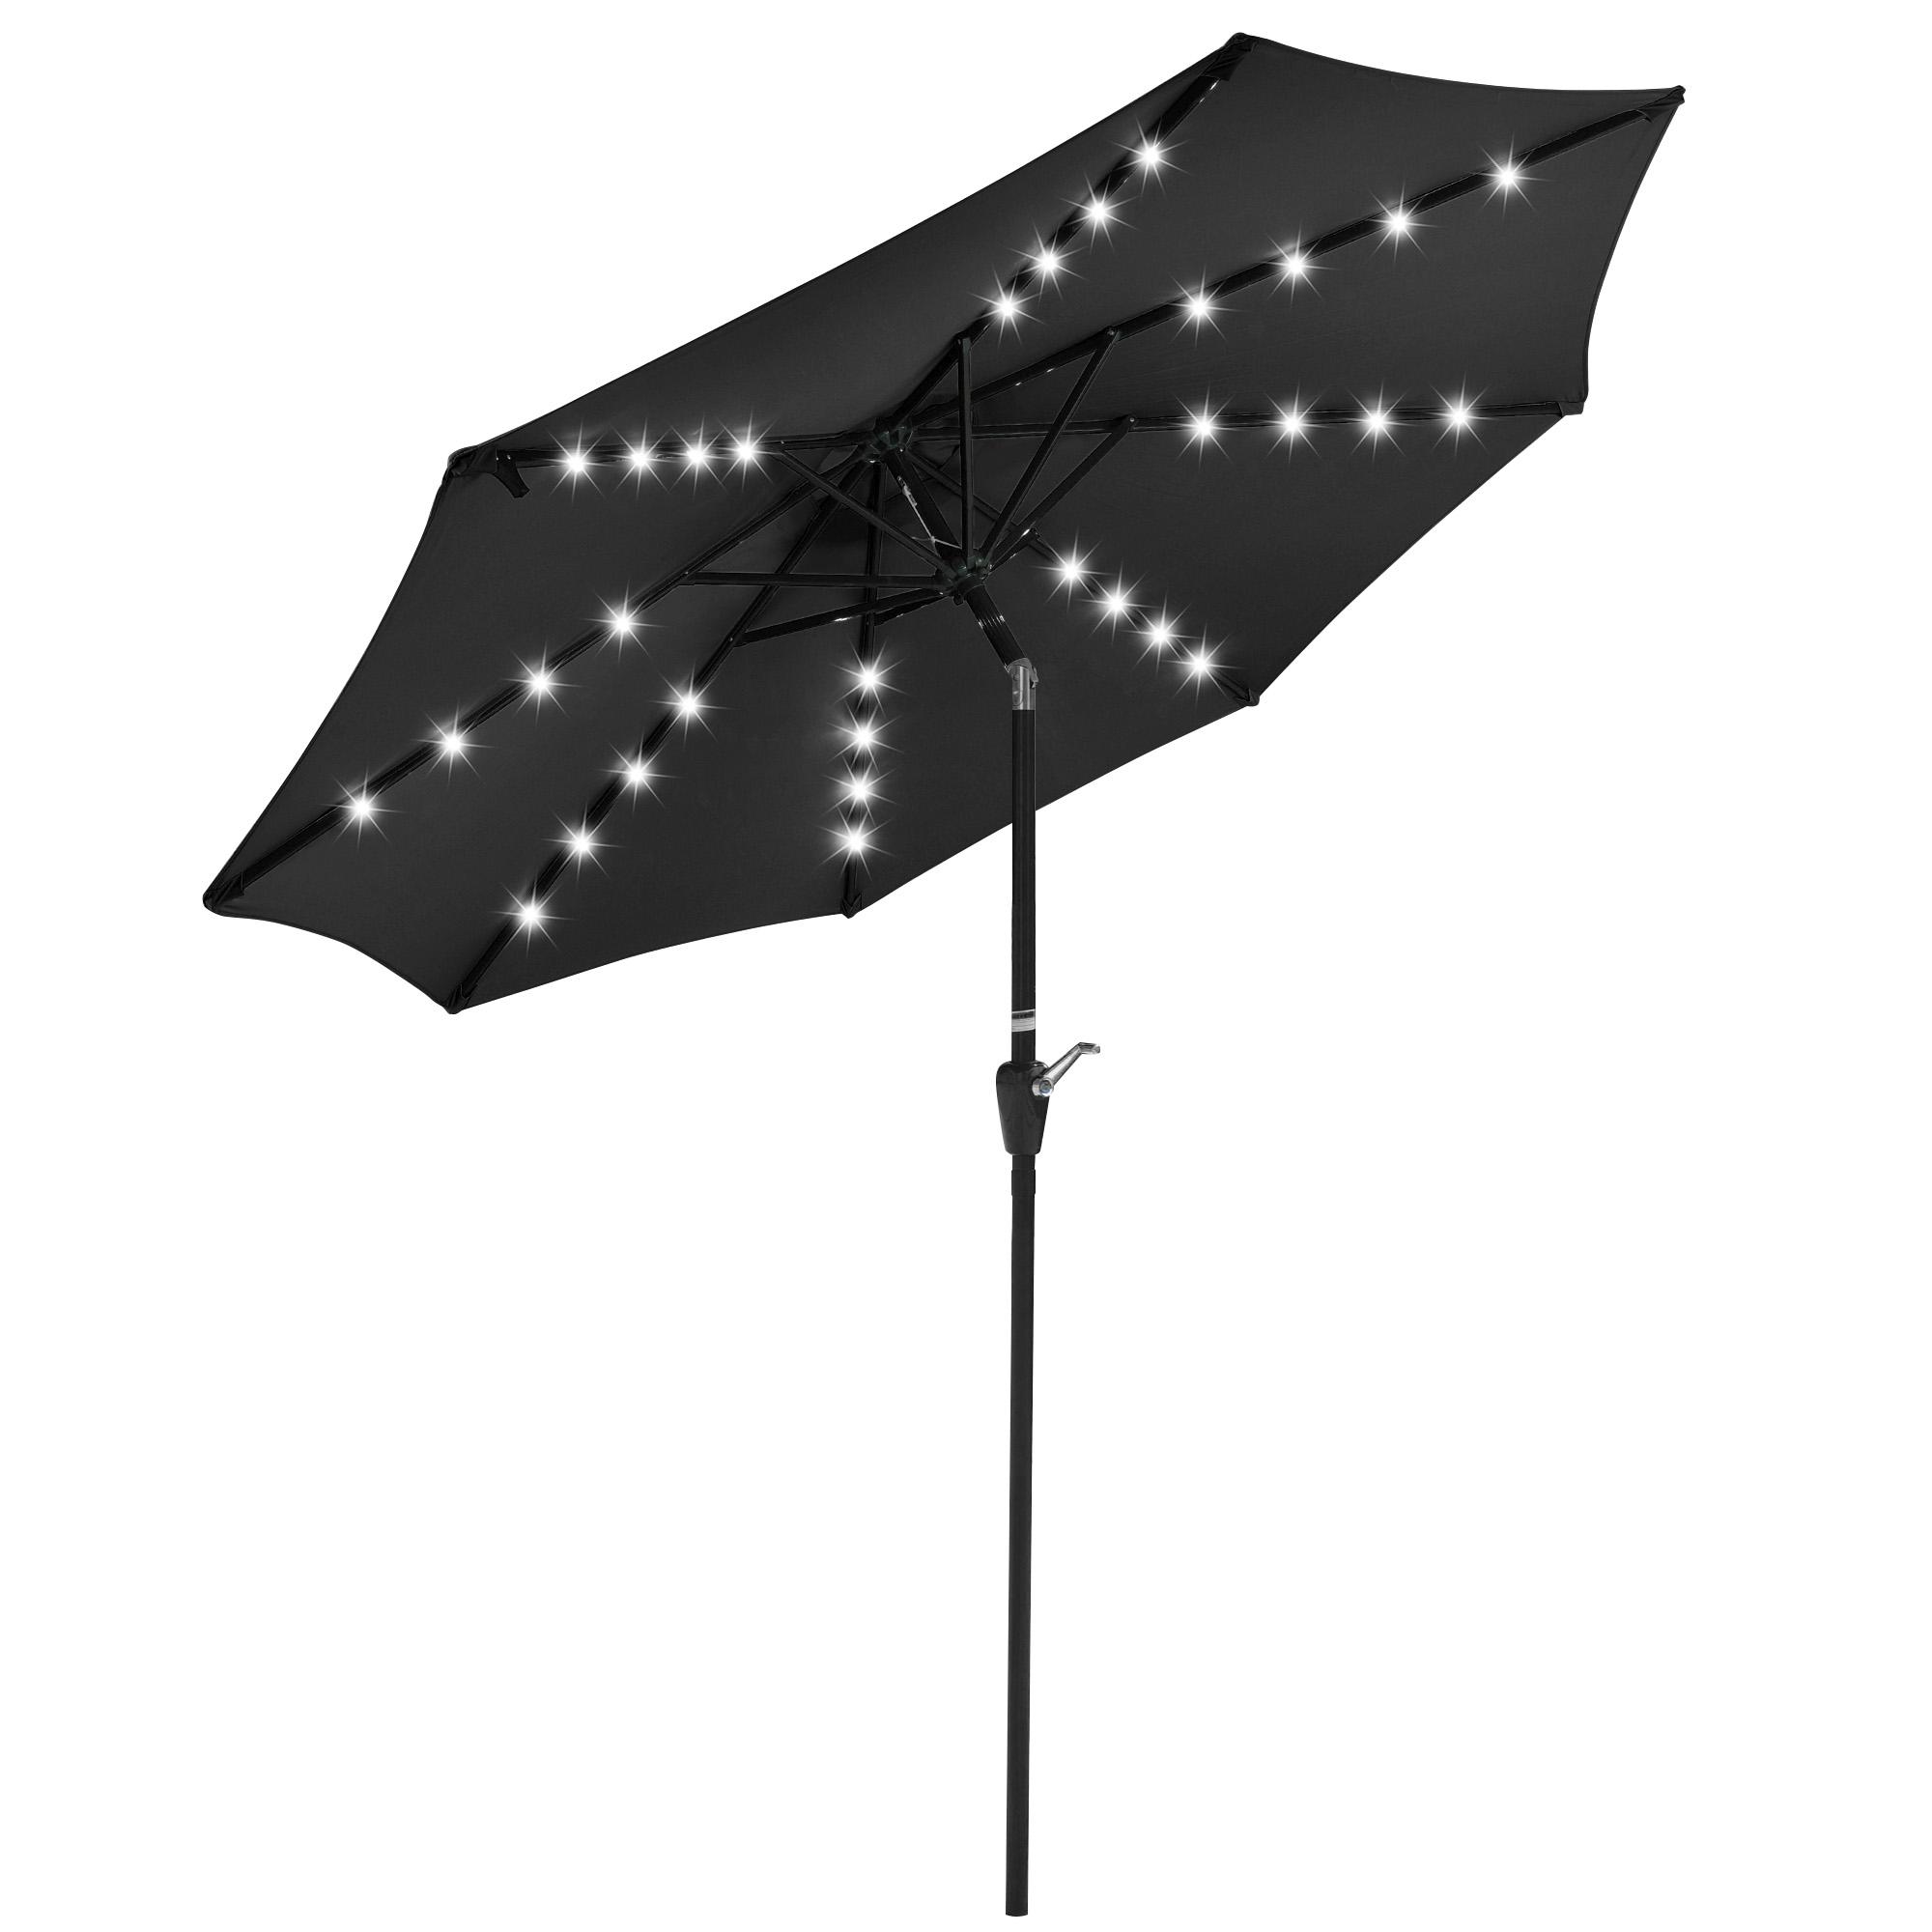 thumbnail 41 - 9' Patio Outdoor Umbrella Solar LED 8 Rib Garden Parasol Yard Deck Table Shade